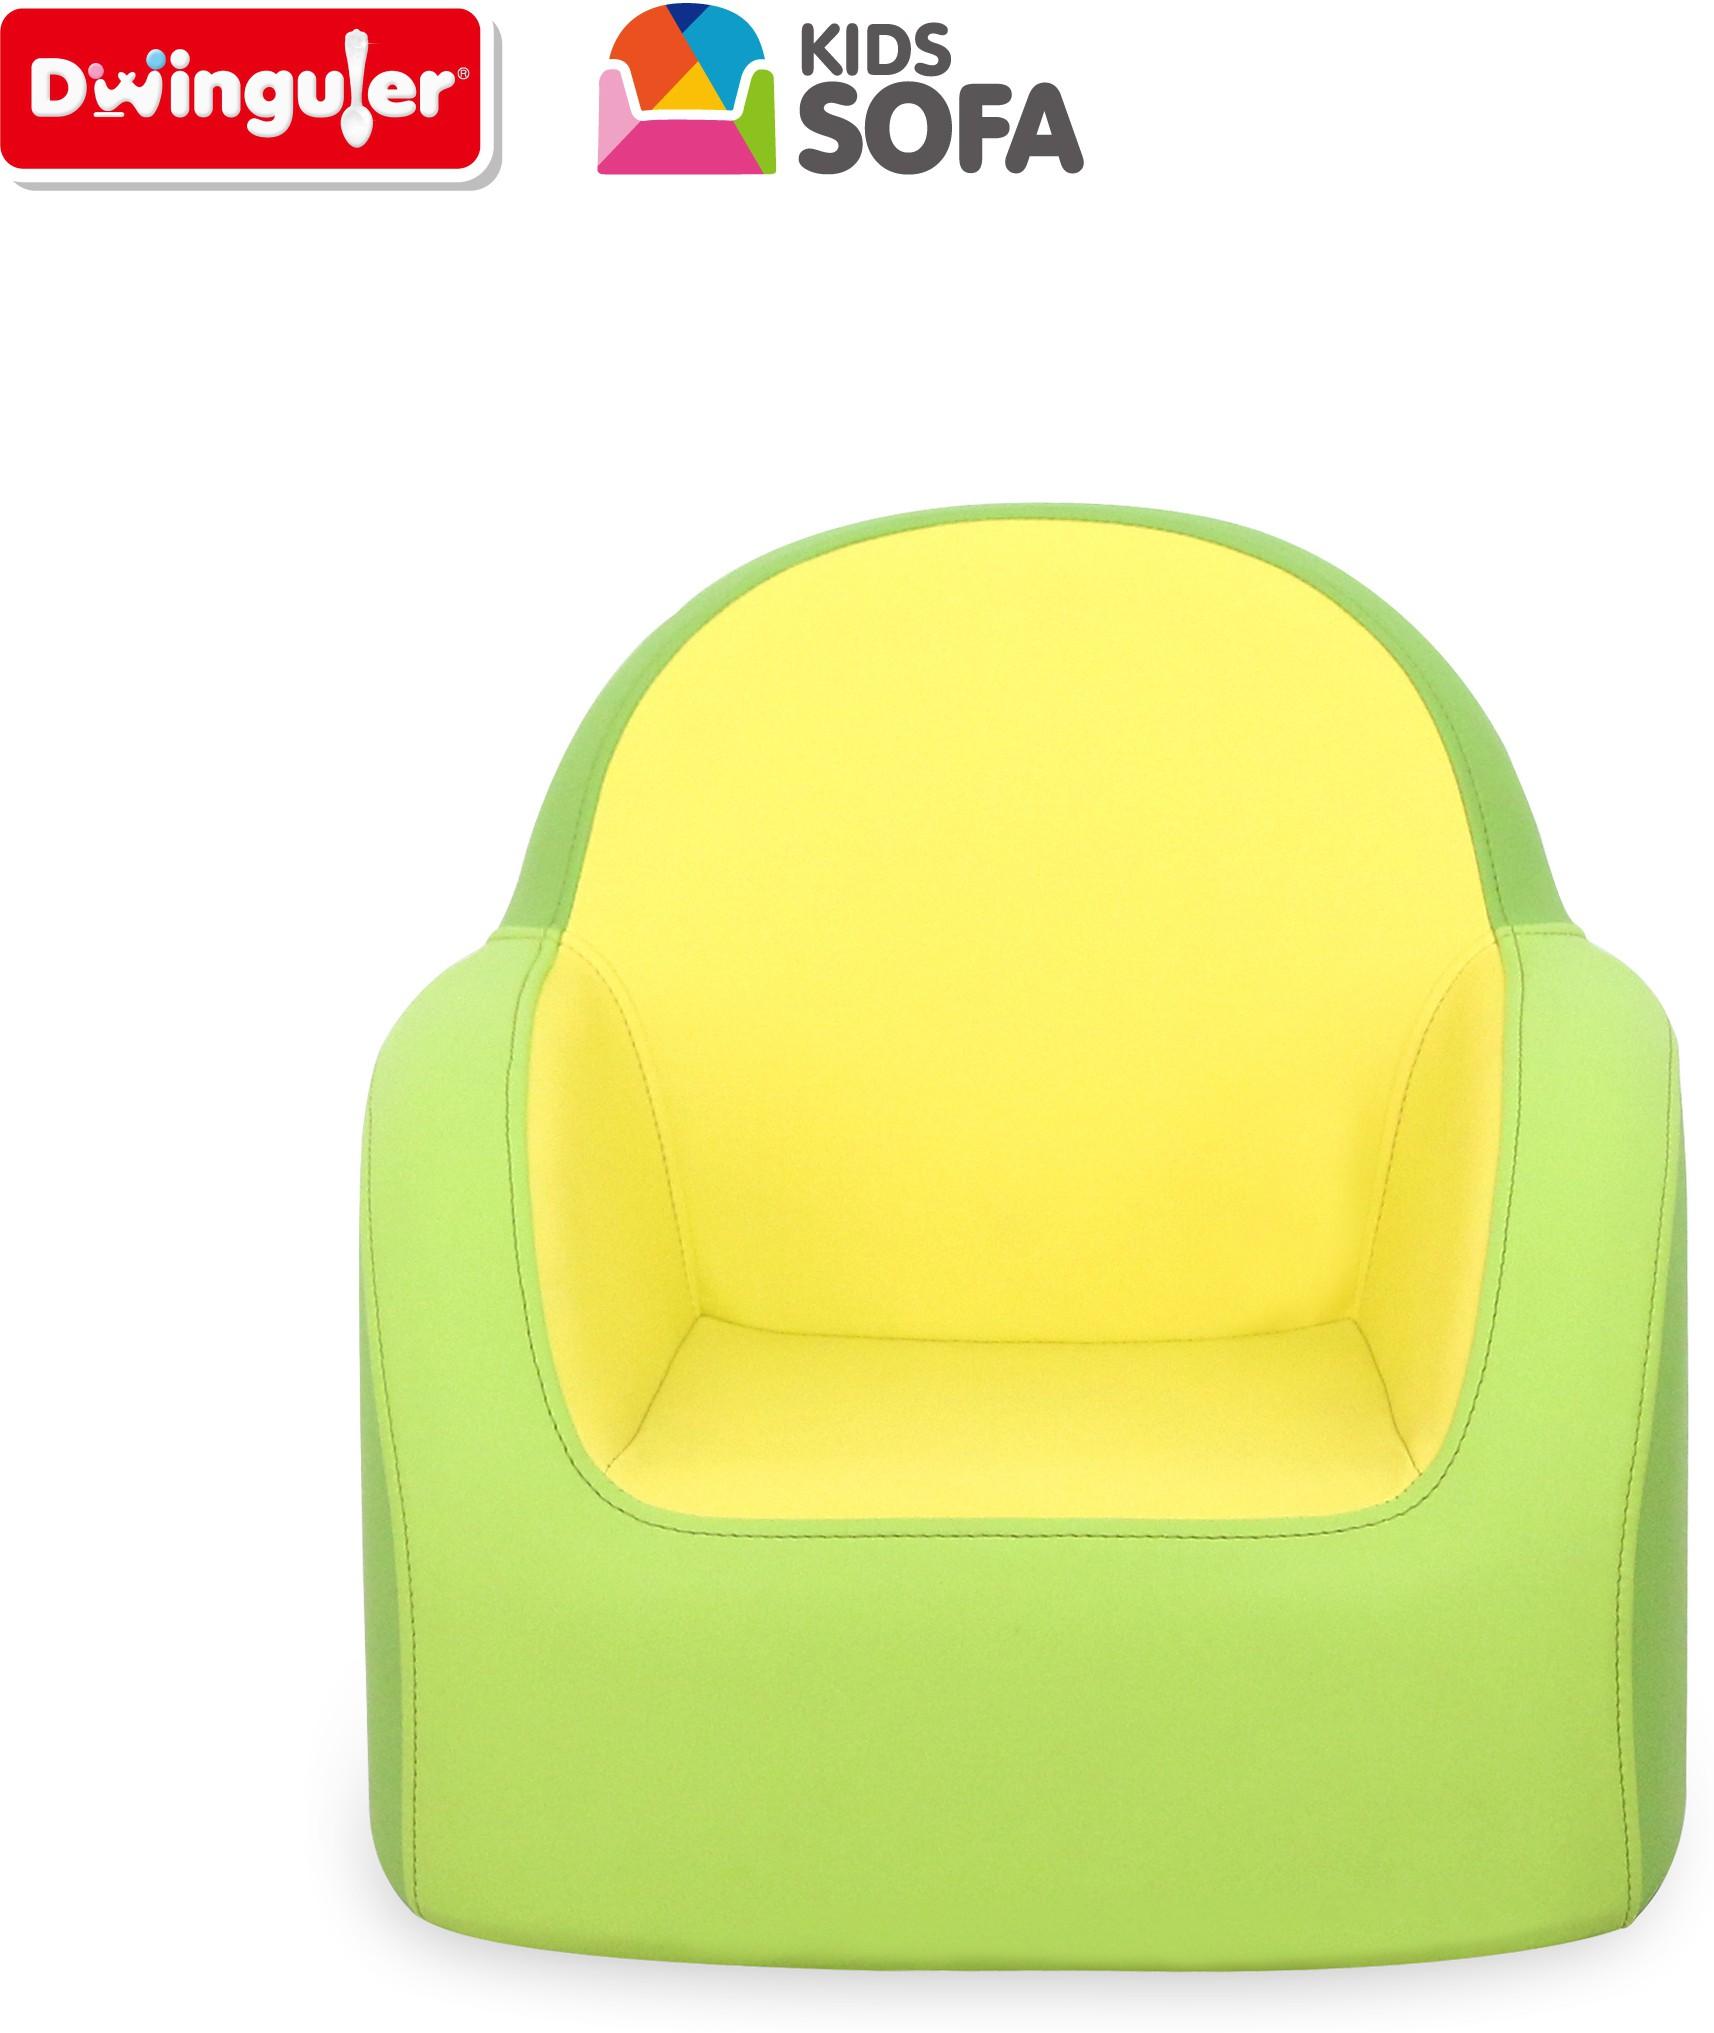 View Dwinguler Kids Sofa - Lime Green Leatherette Sofa(Finish Color - Lime Green) Furniture (Dwinguler)